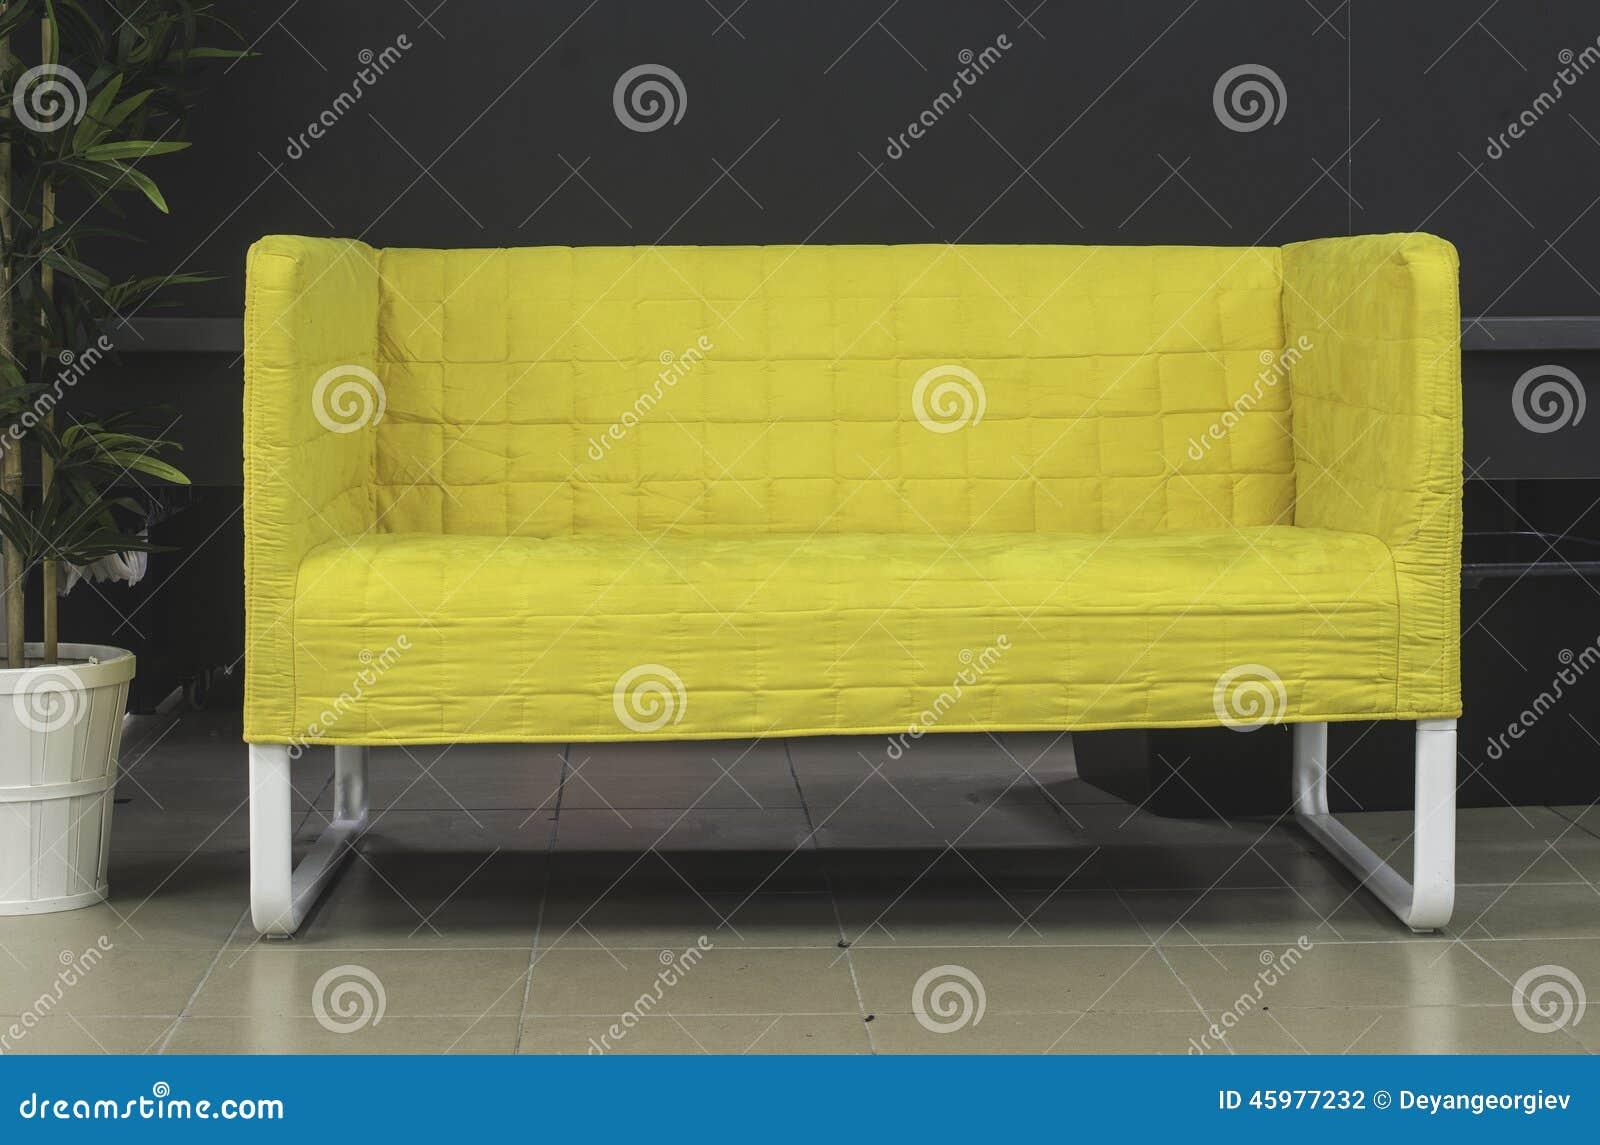 kleine bank stock foto afbeelding bestaande uit geel. Black Bedroom Furniture Sets. Home Design Ideas